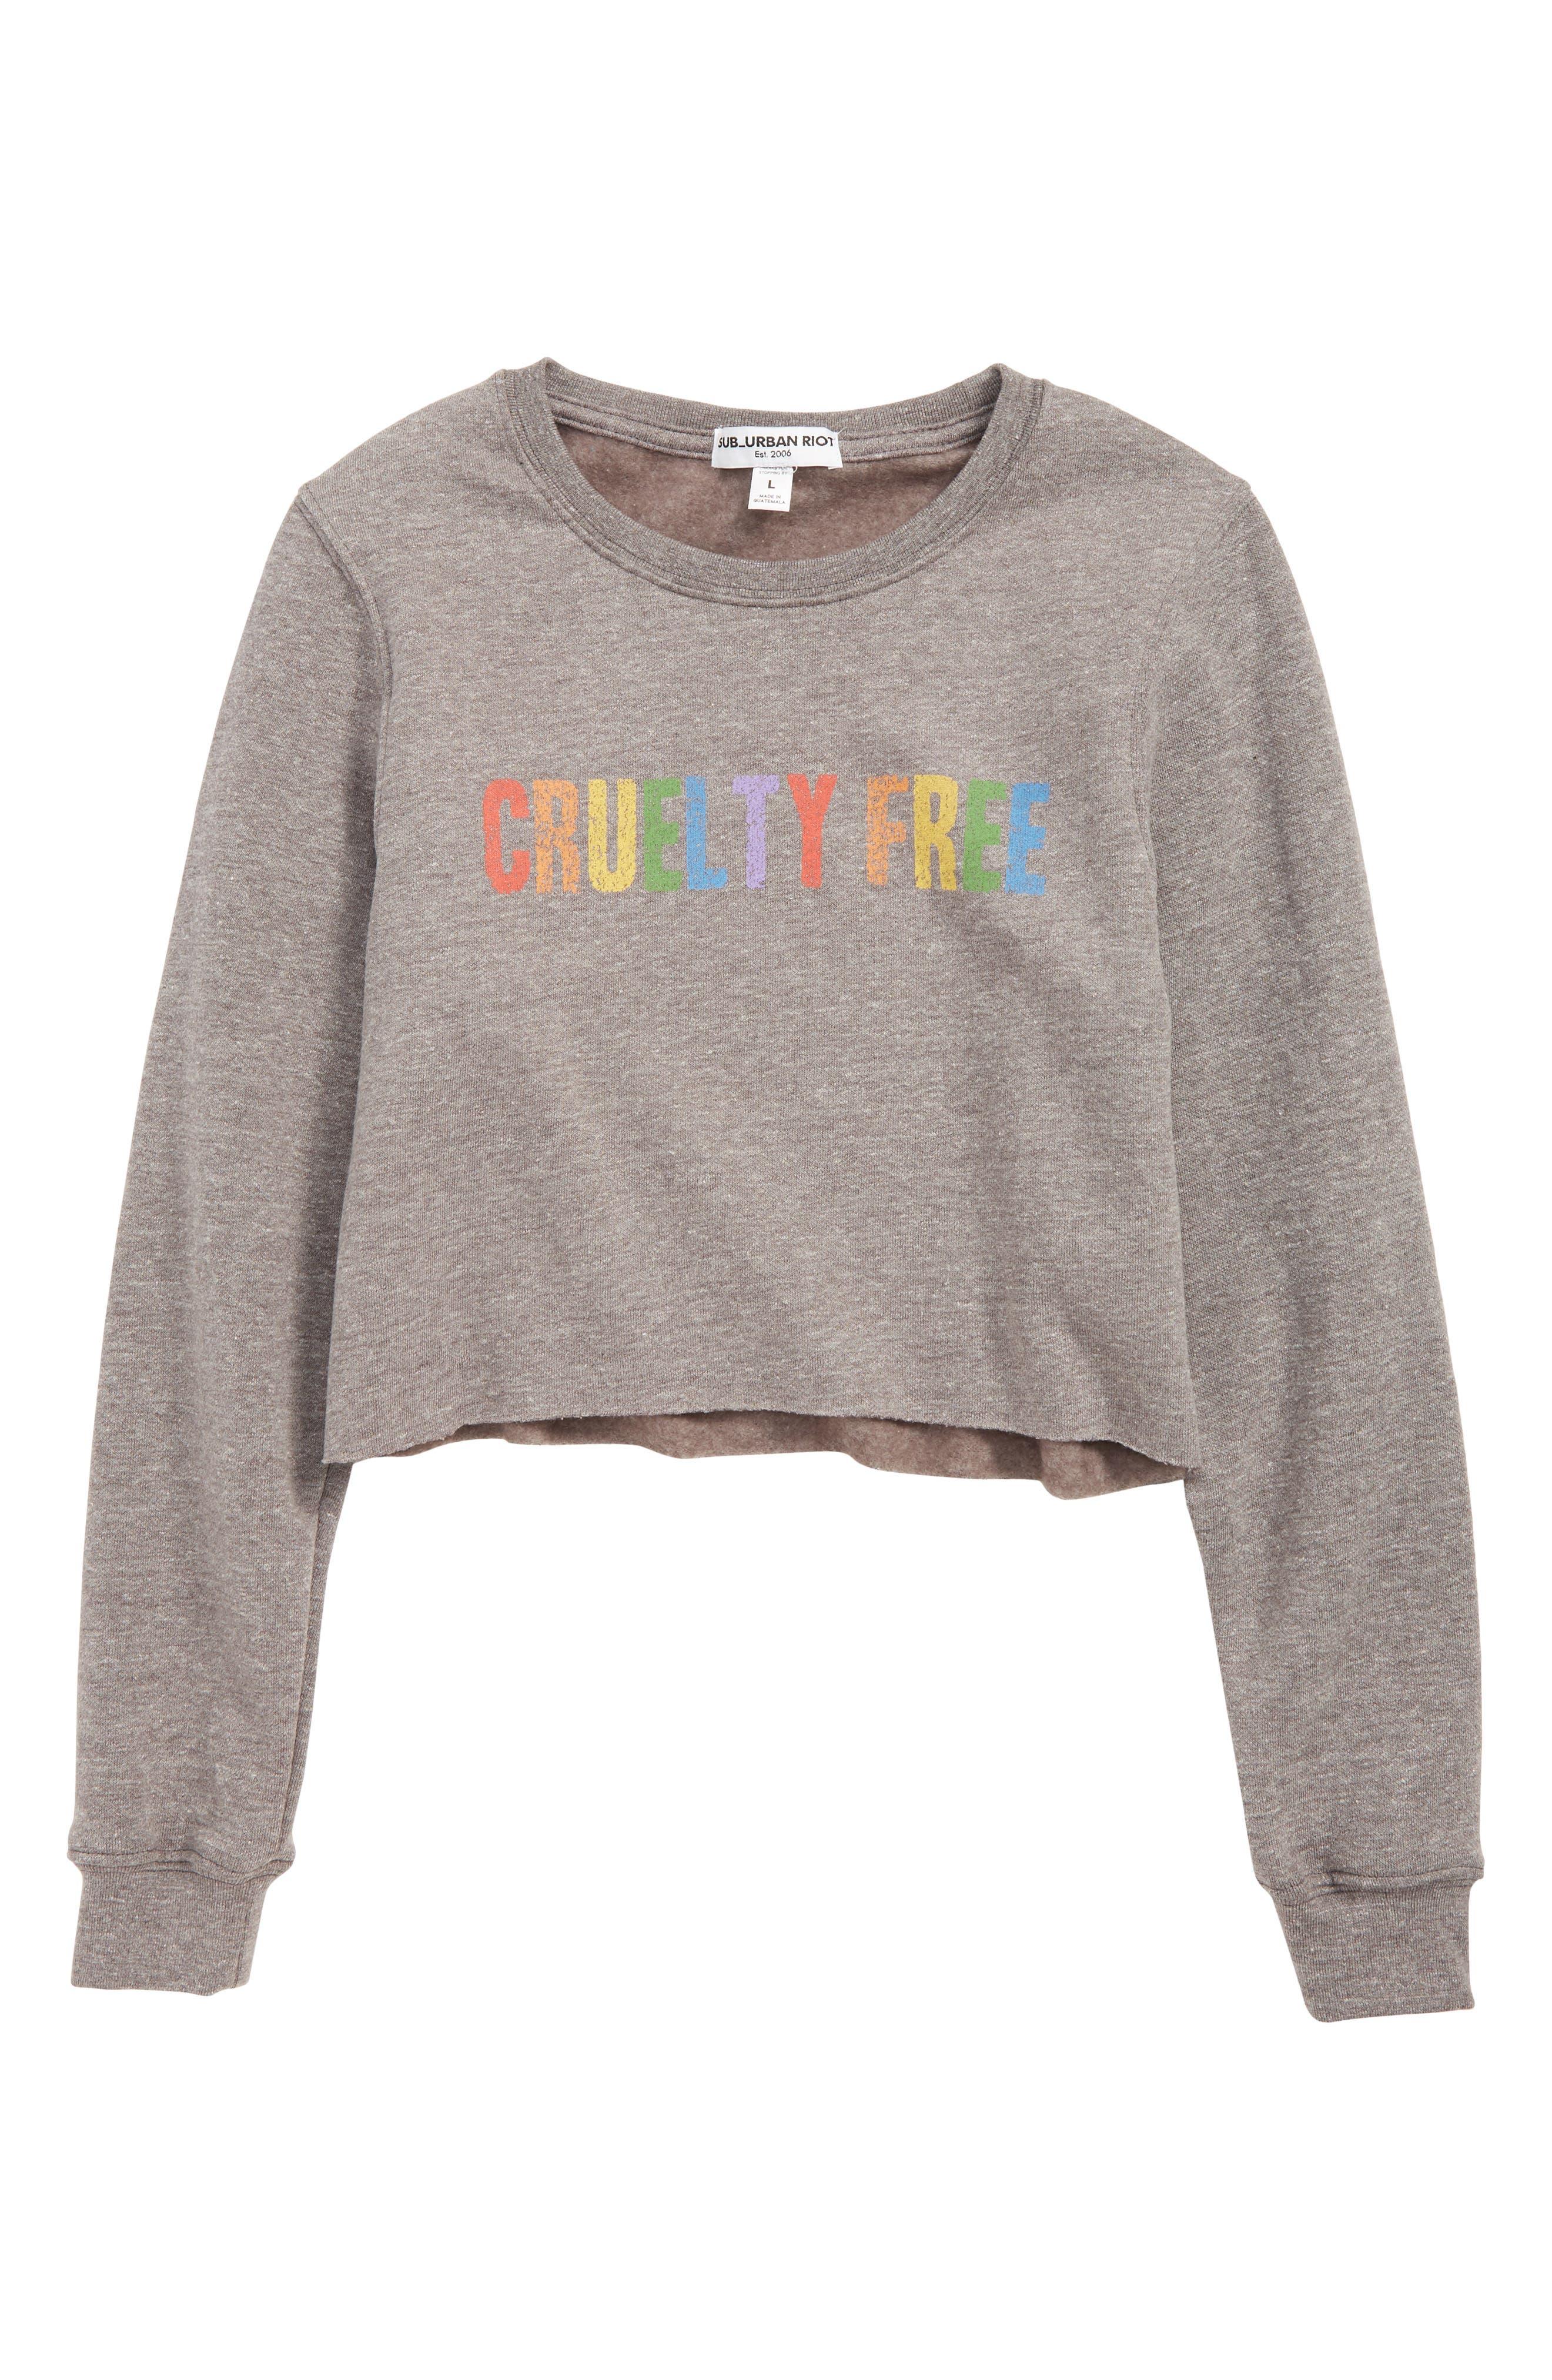 SUB_URBAN RIOT Free Graphic Crop Sweatshirt, Main, color, HEATHER GRAY